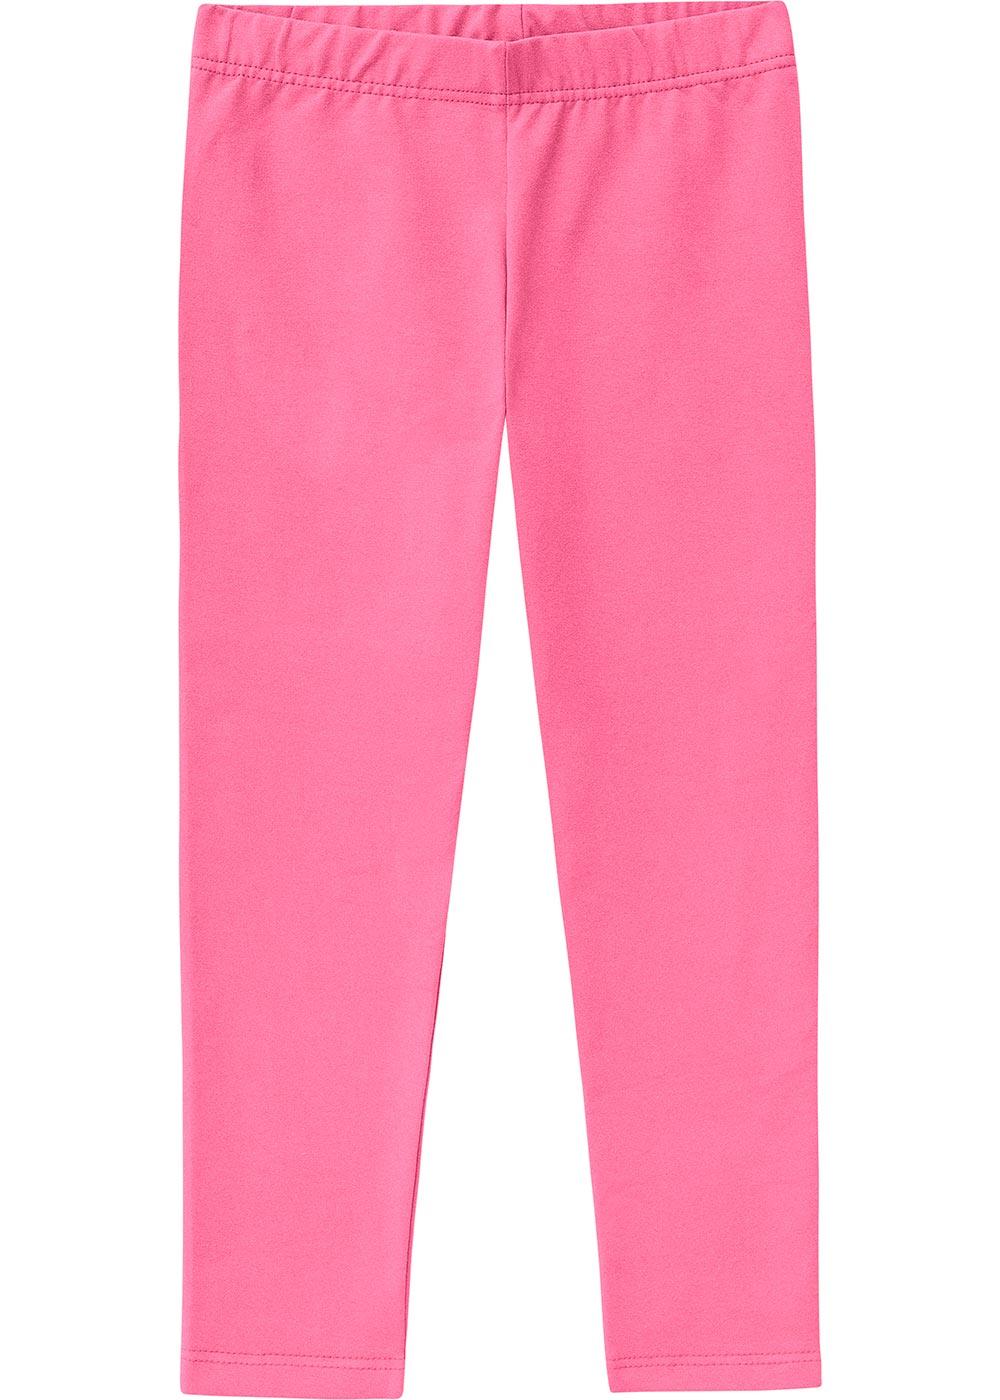 Legging Infantil Feminina Pink Básica - Malwee